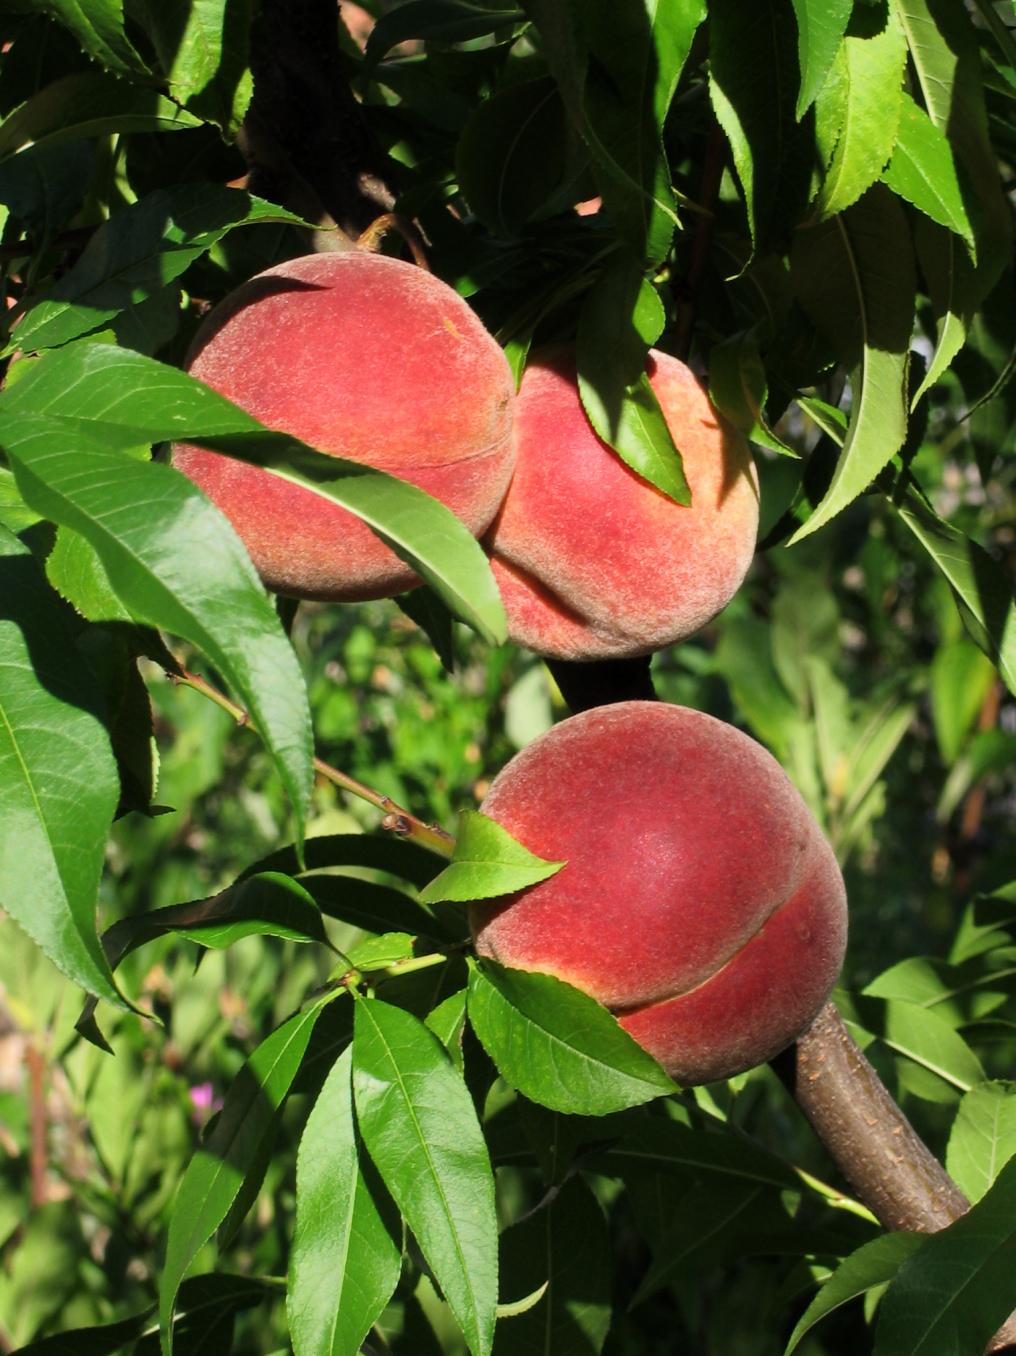 ... upload.wikimedia.org/wikipedia/commons/a/a4/Vineyard_peaches_de.jpg